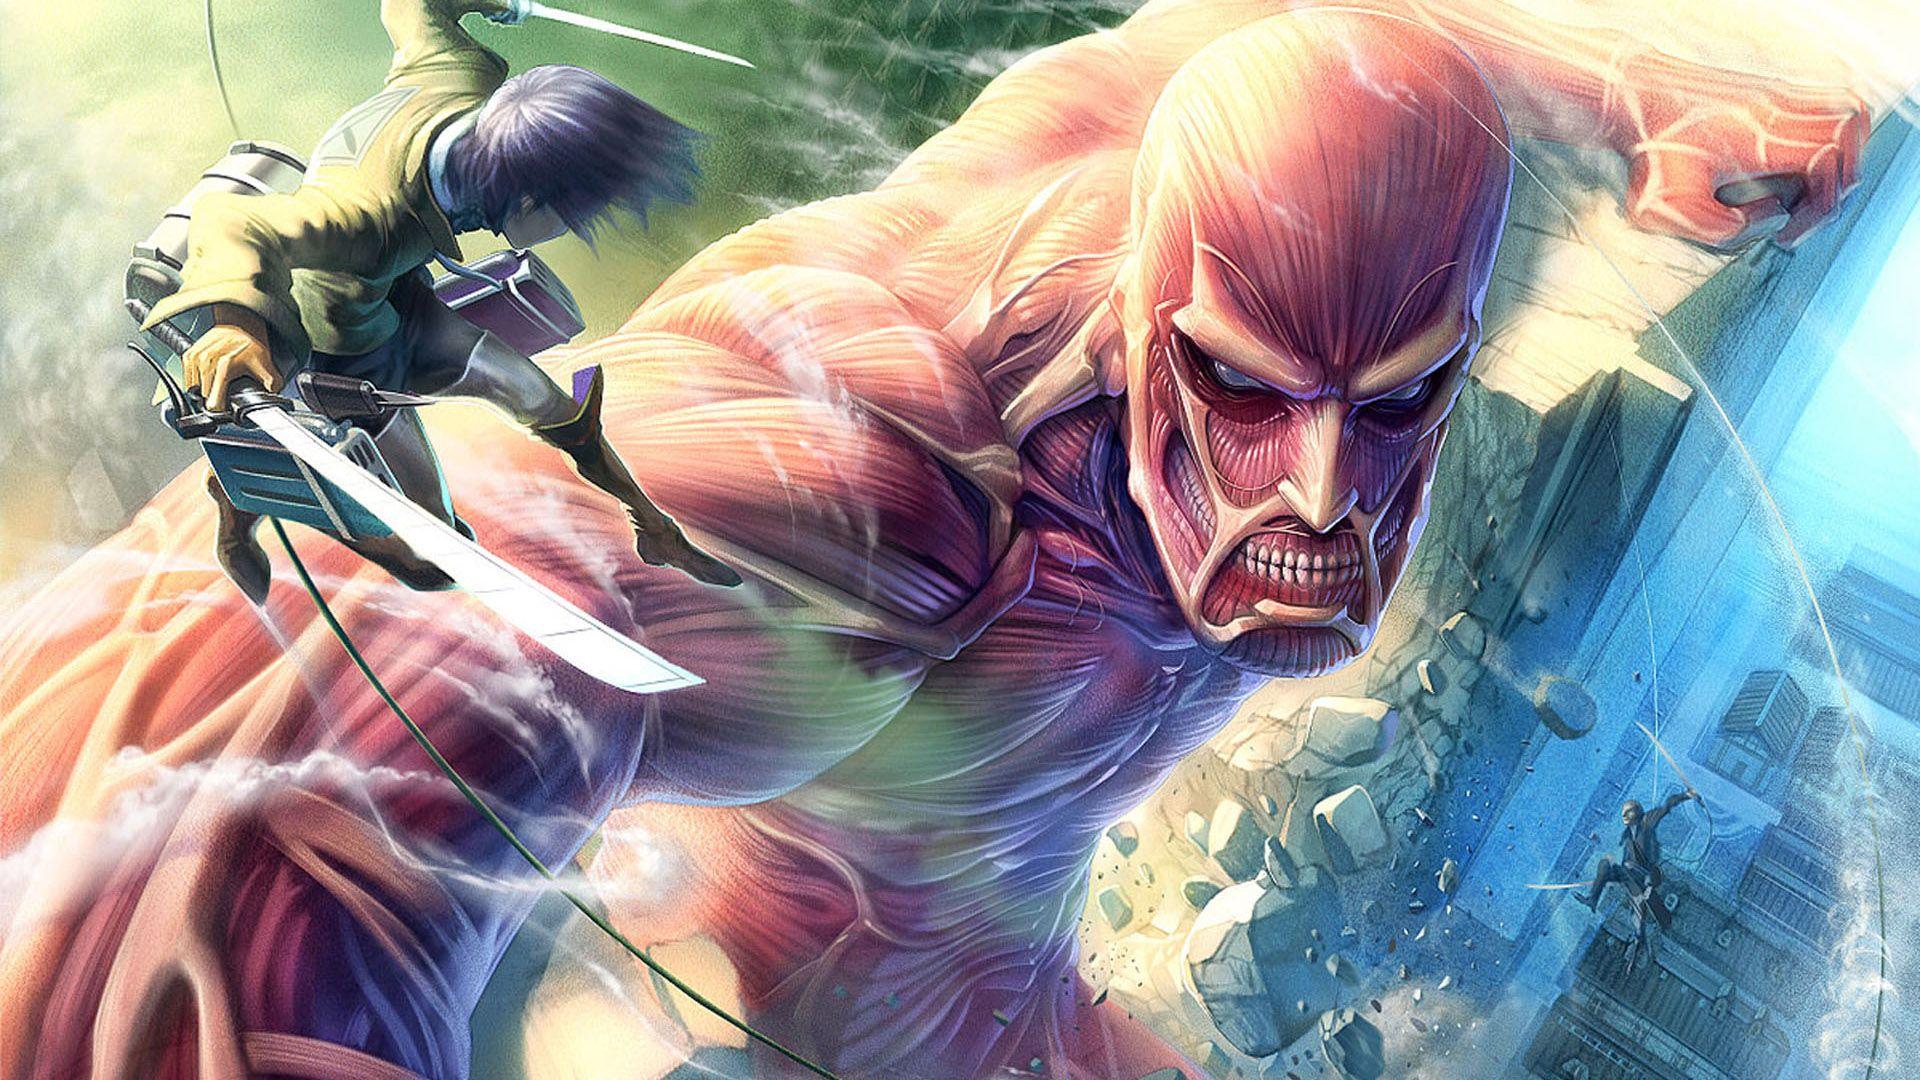 Eren Jaeger vs Colossal Titan, Eren battling a Colossal